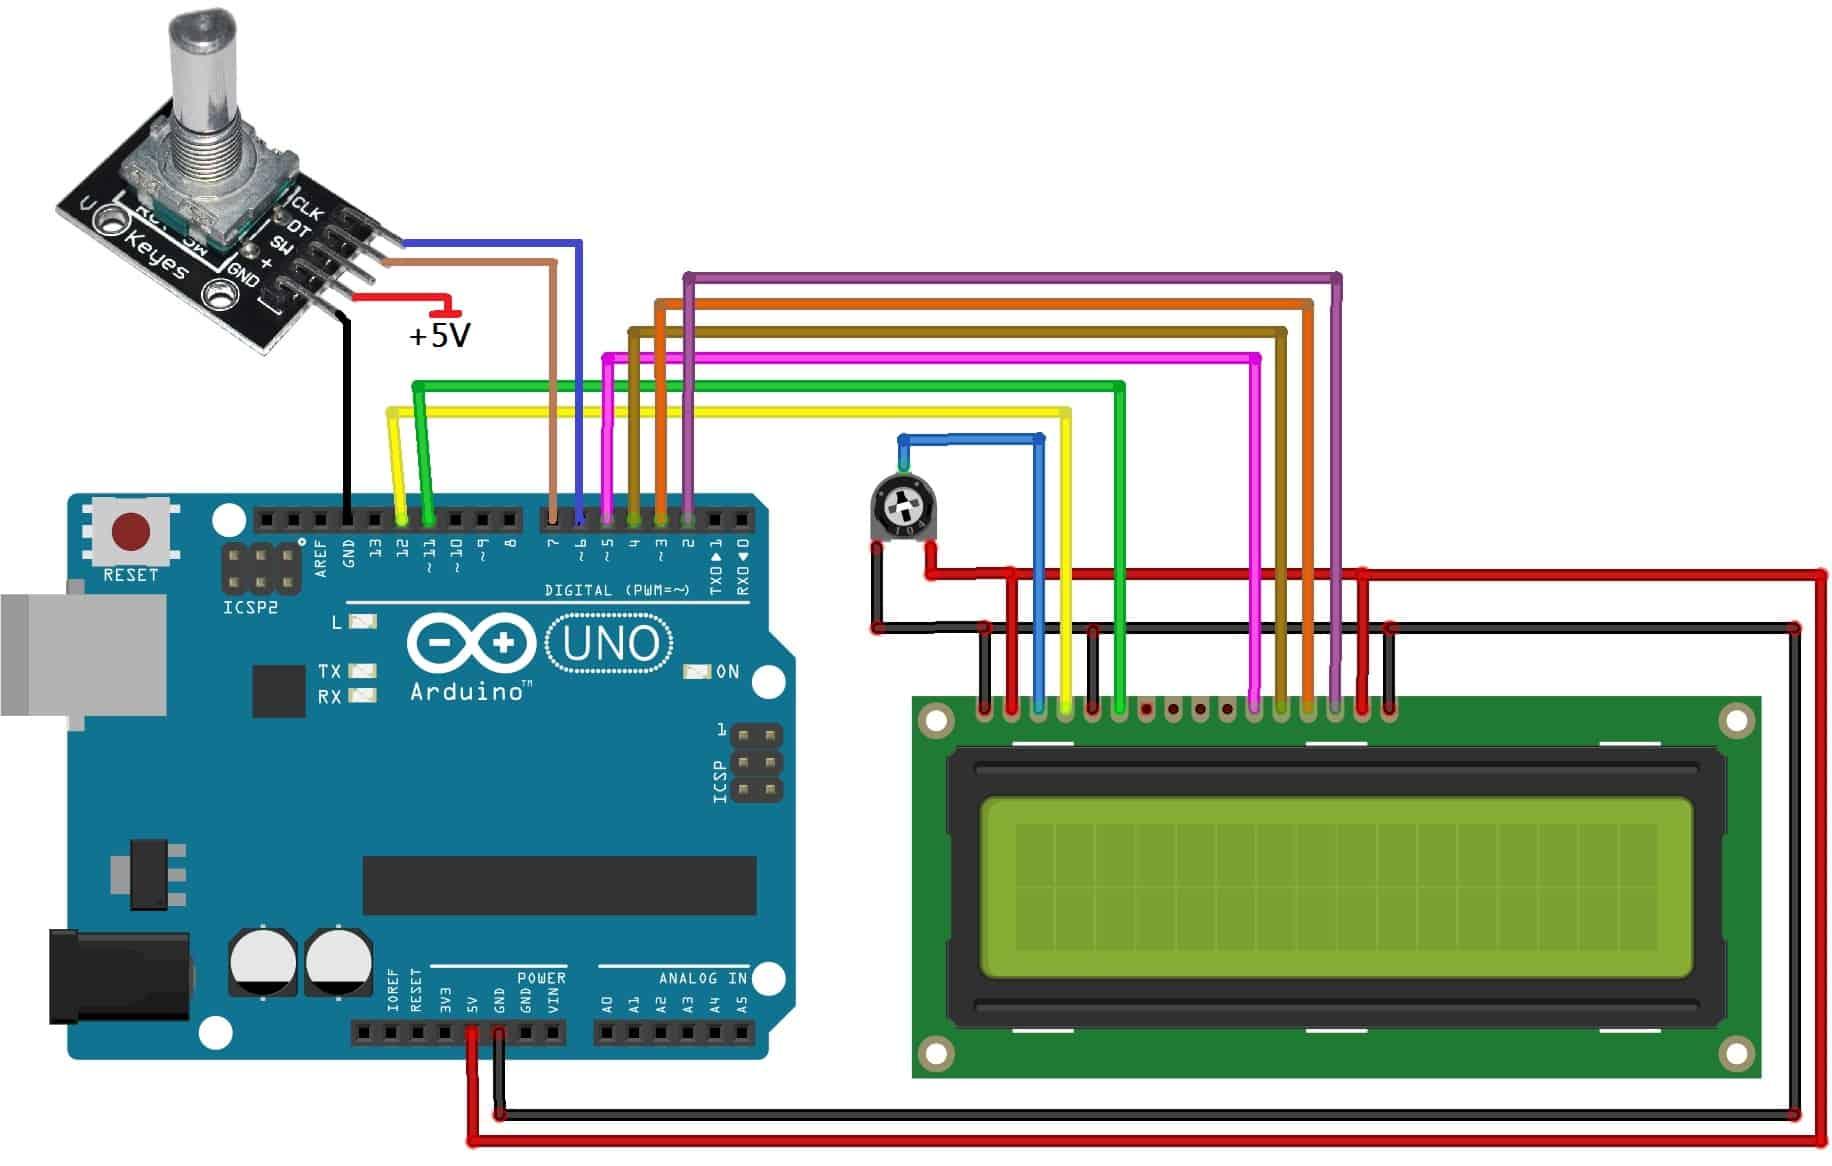 how to use rotary encoder with arduino rotary encoder circuit diagram bu0836x 12 bit joystick board [bu0836x